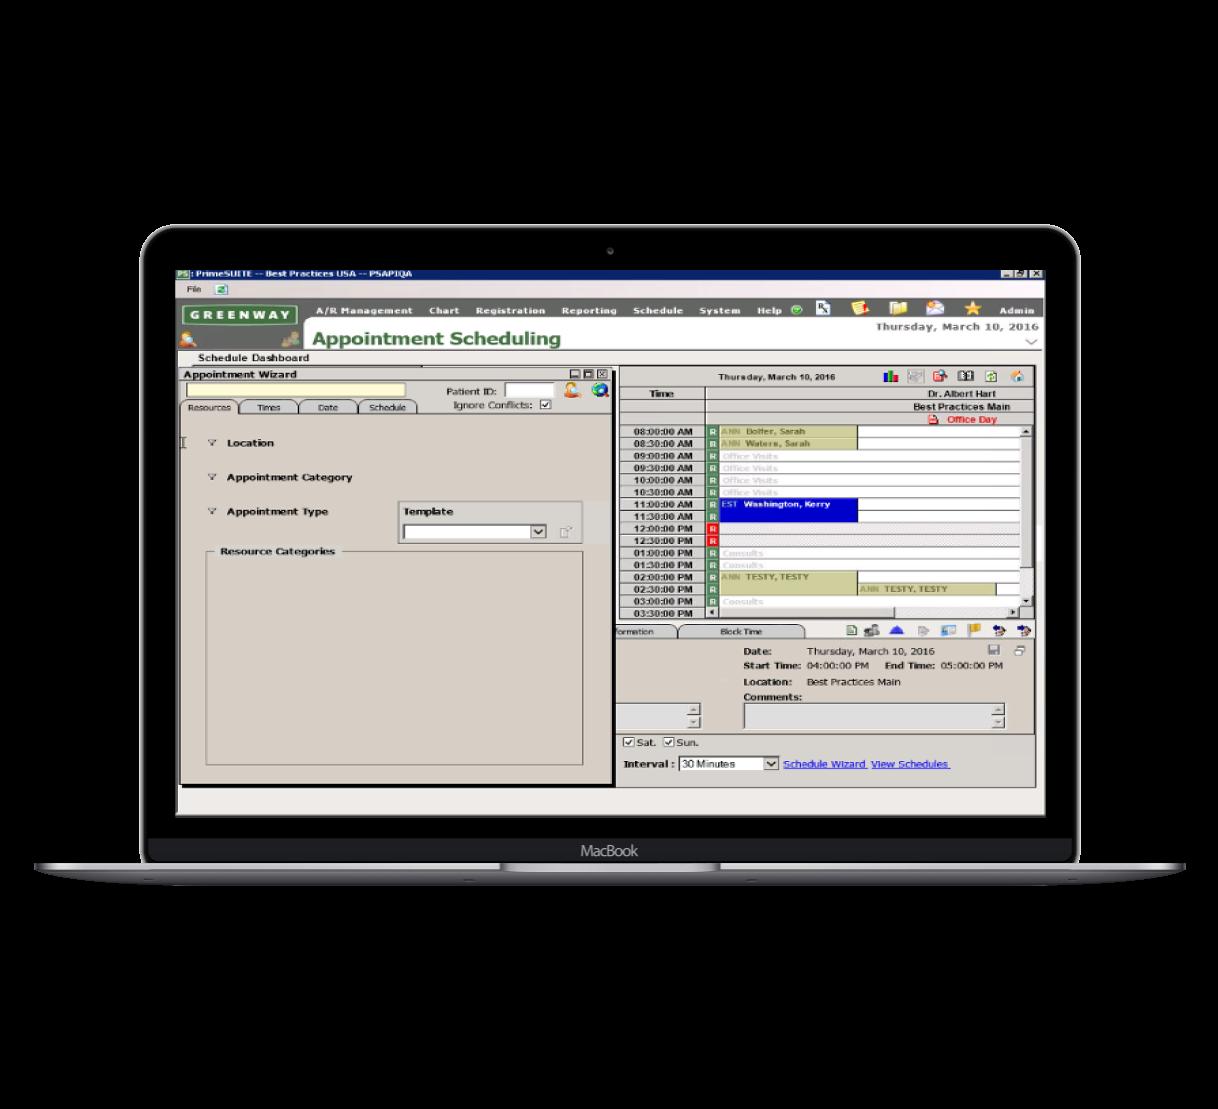 Greenway-UI-in-Macbook.png